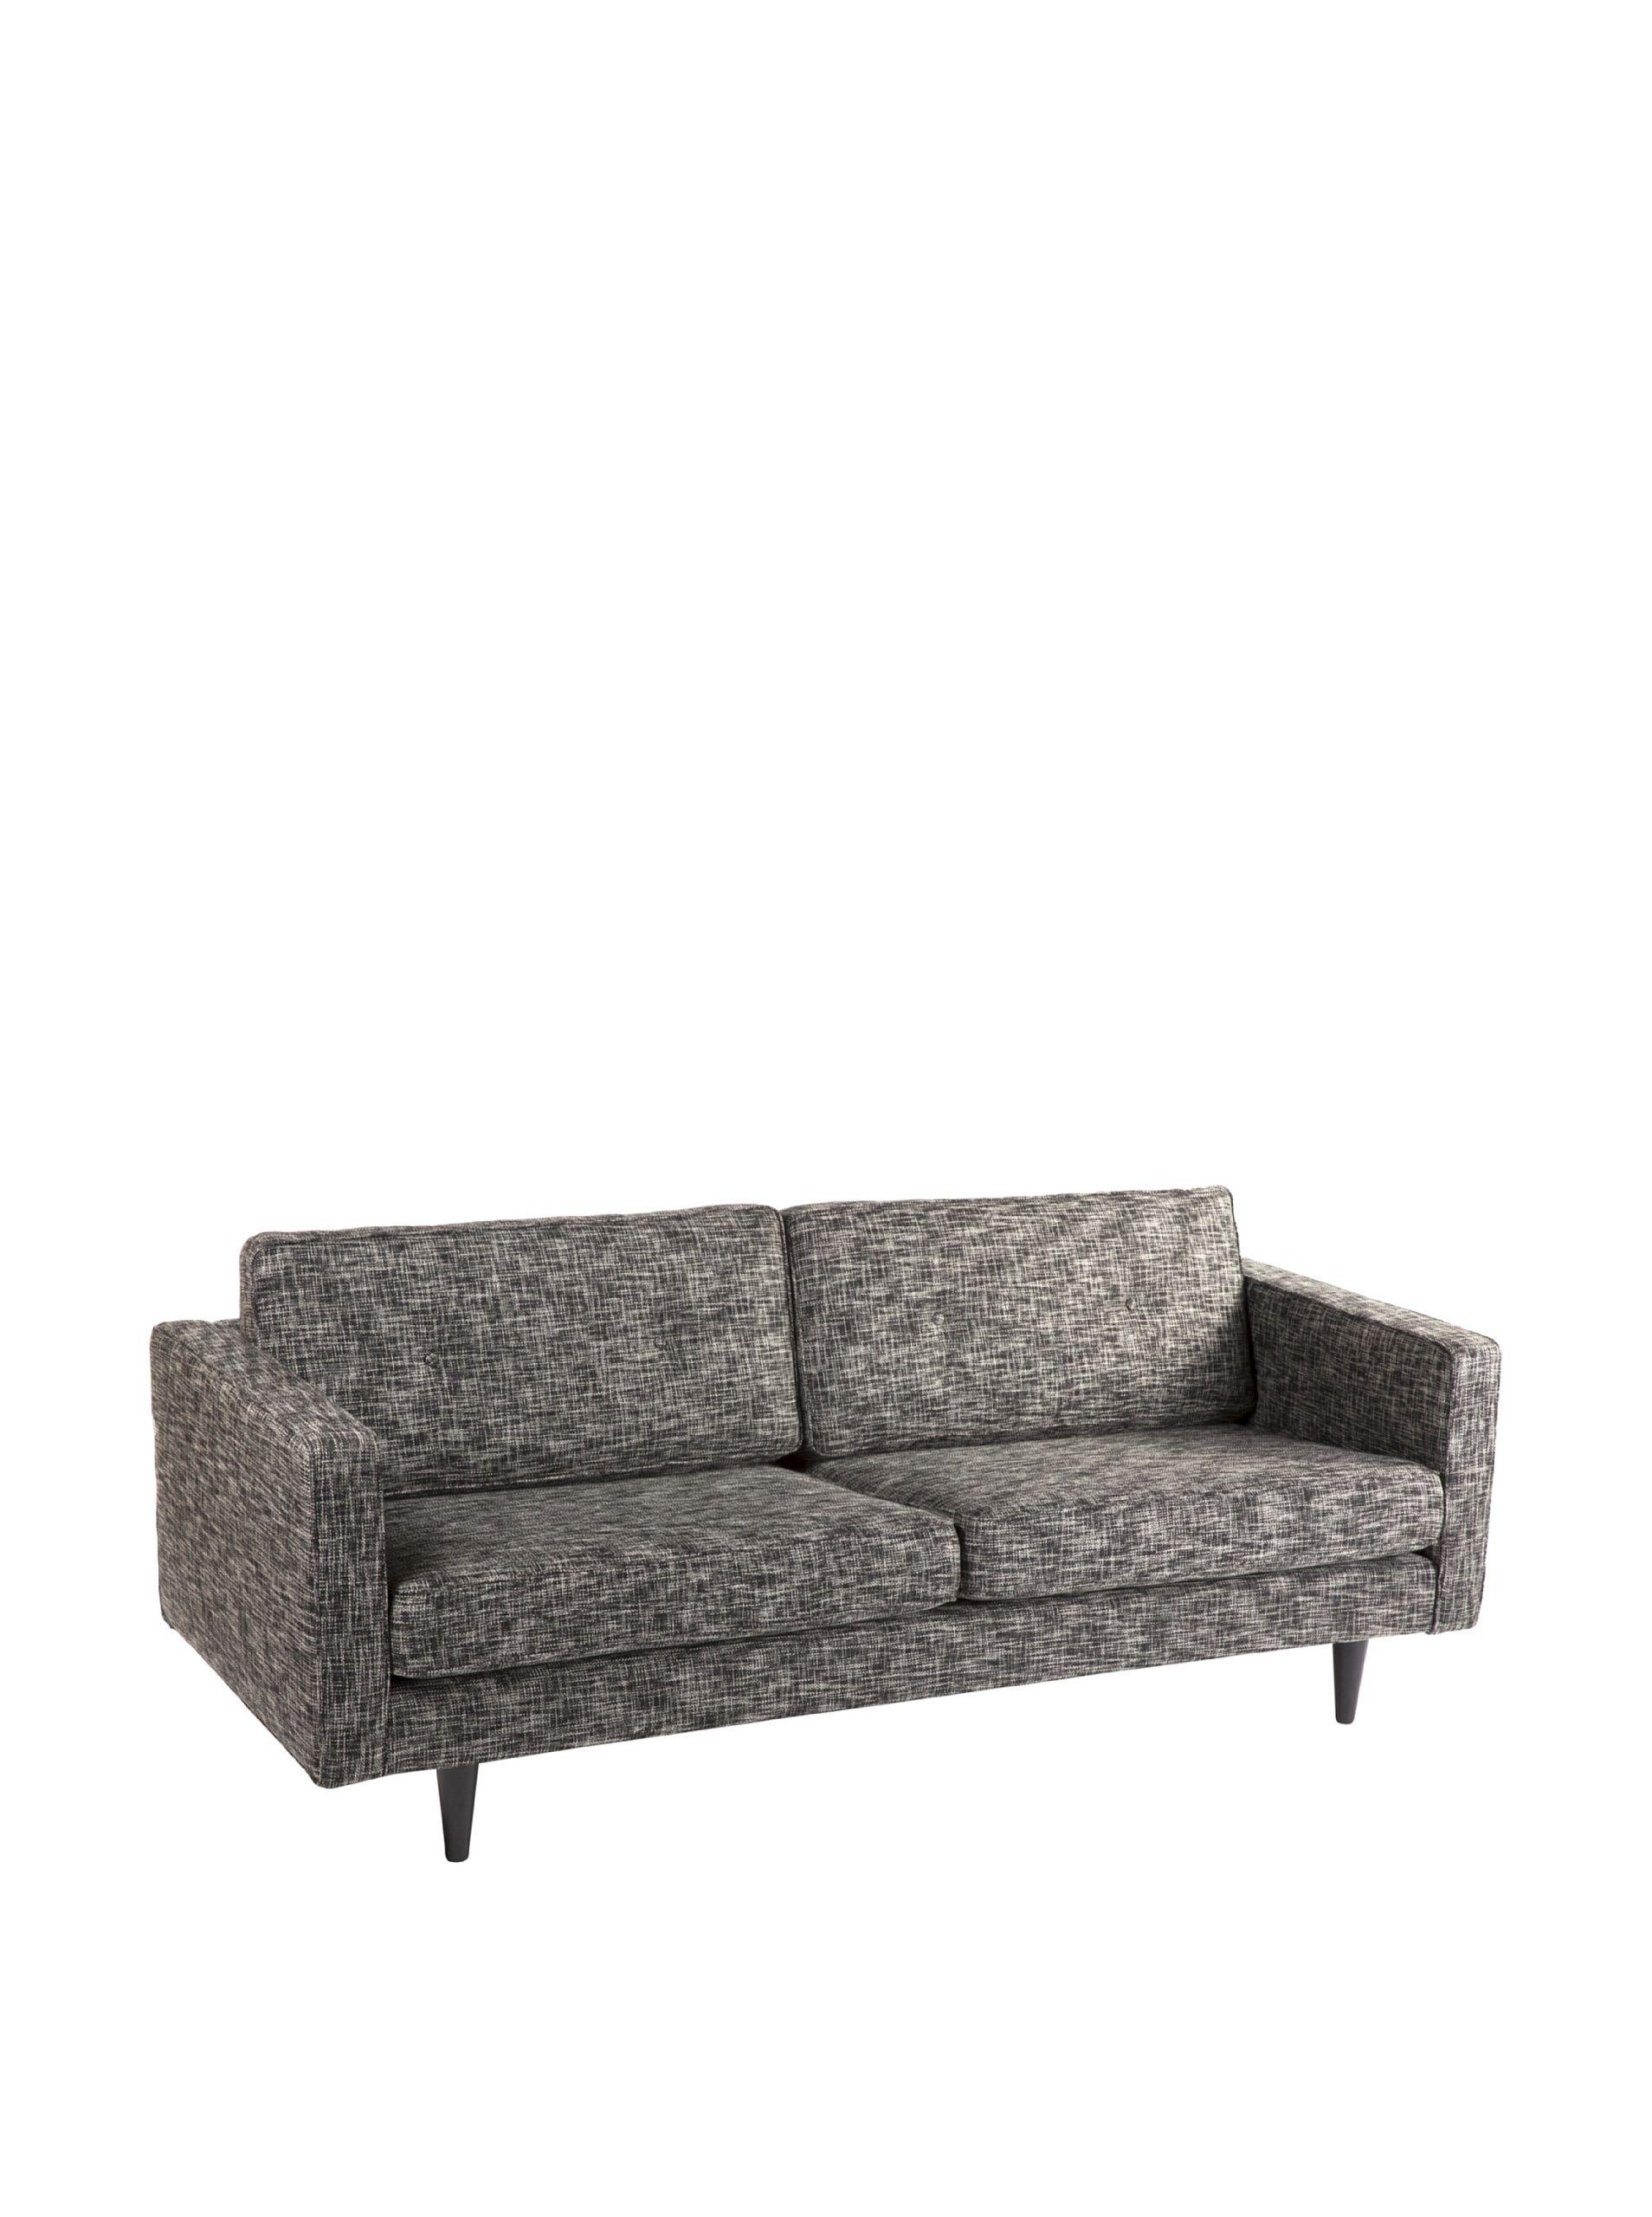 Control Brand The Parma Sofa, Twill Black at MYHABIT